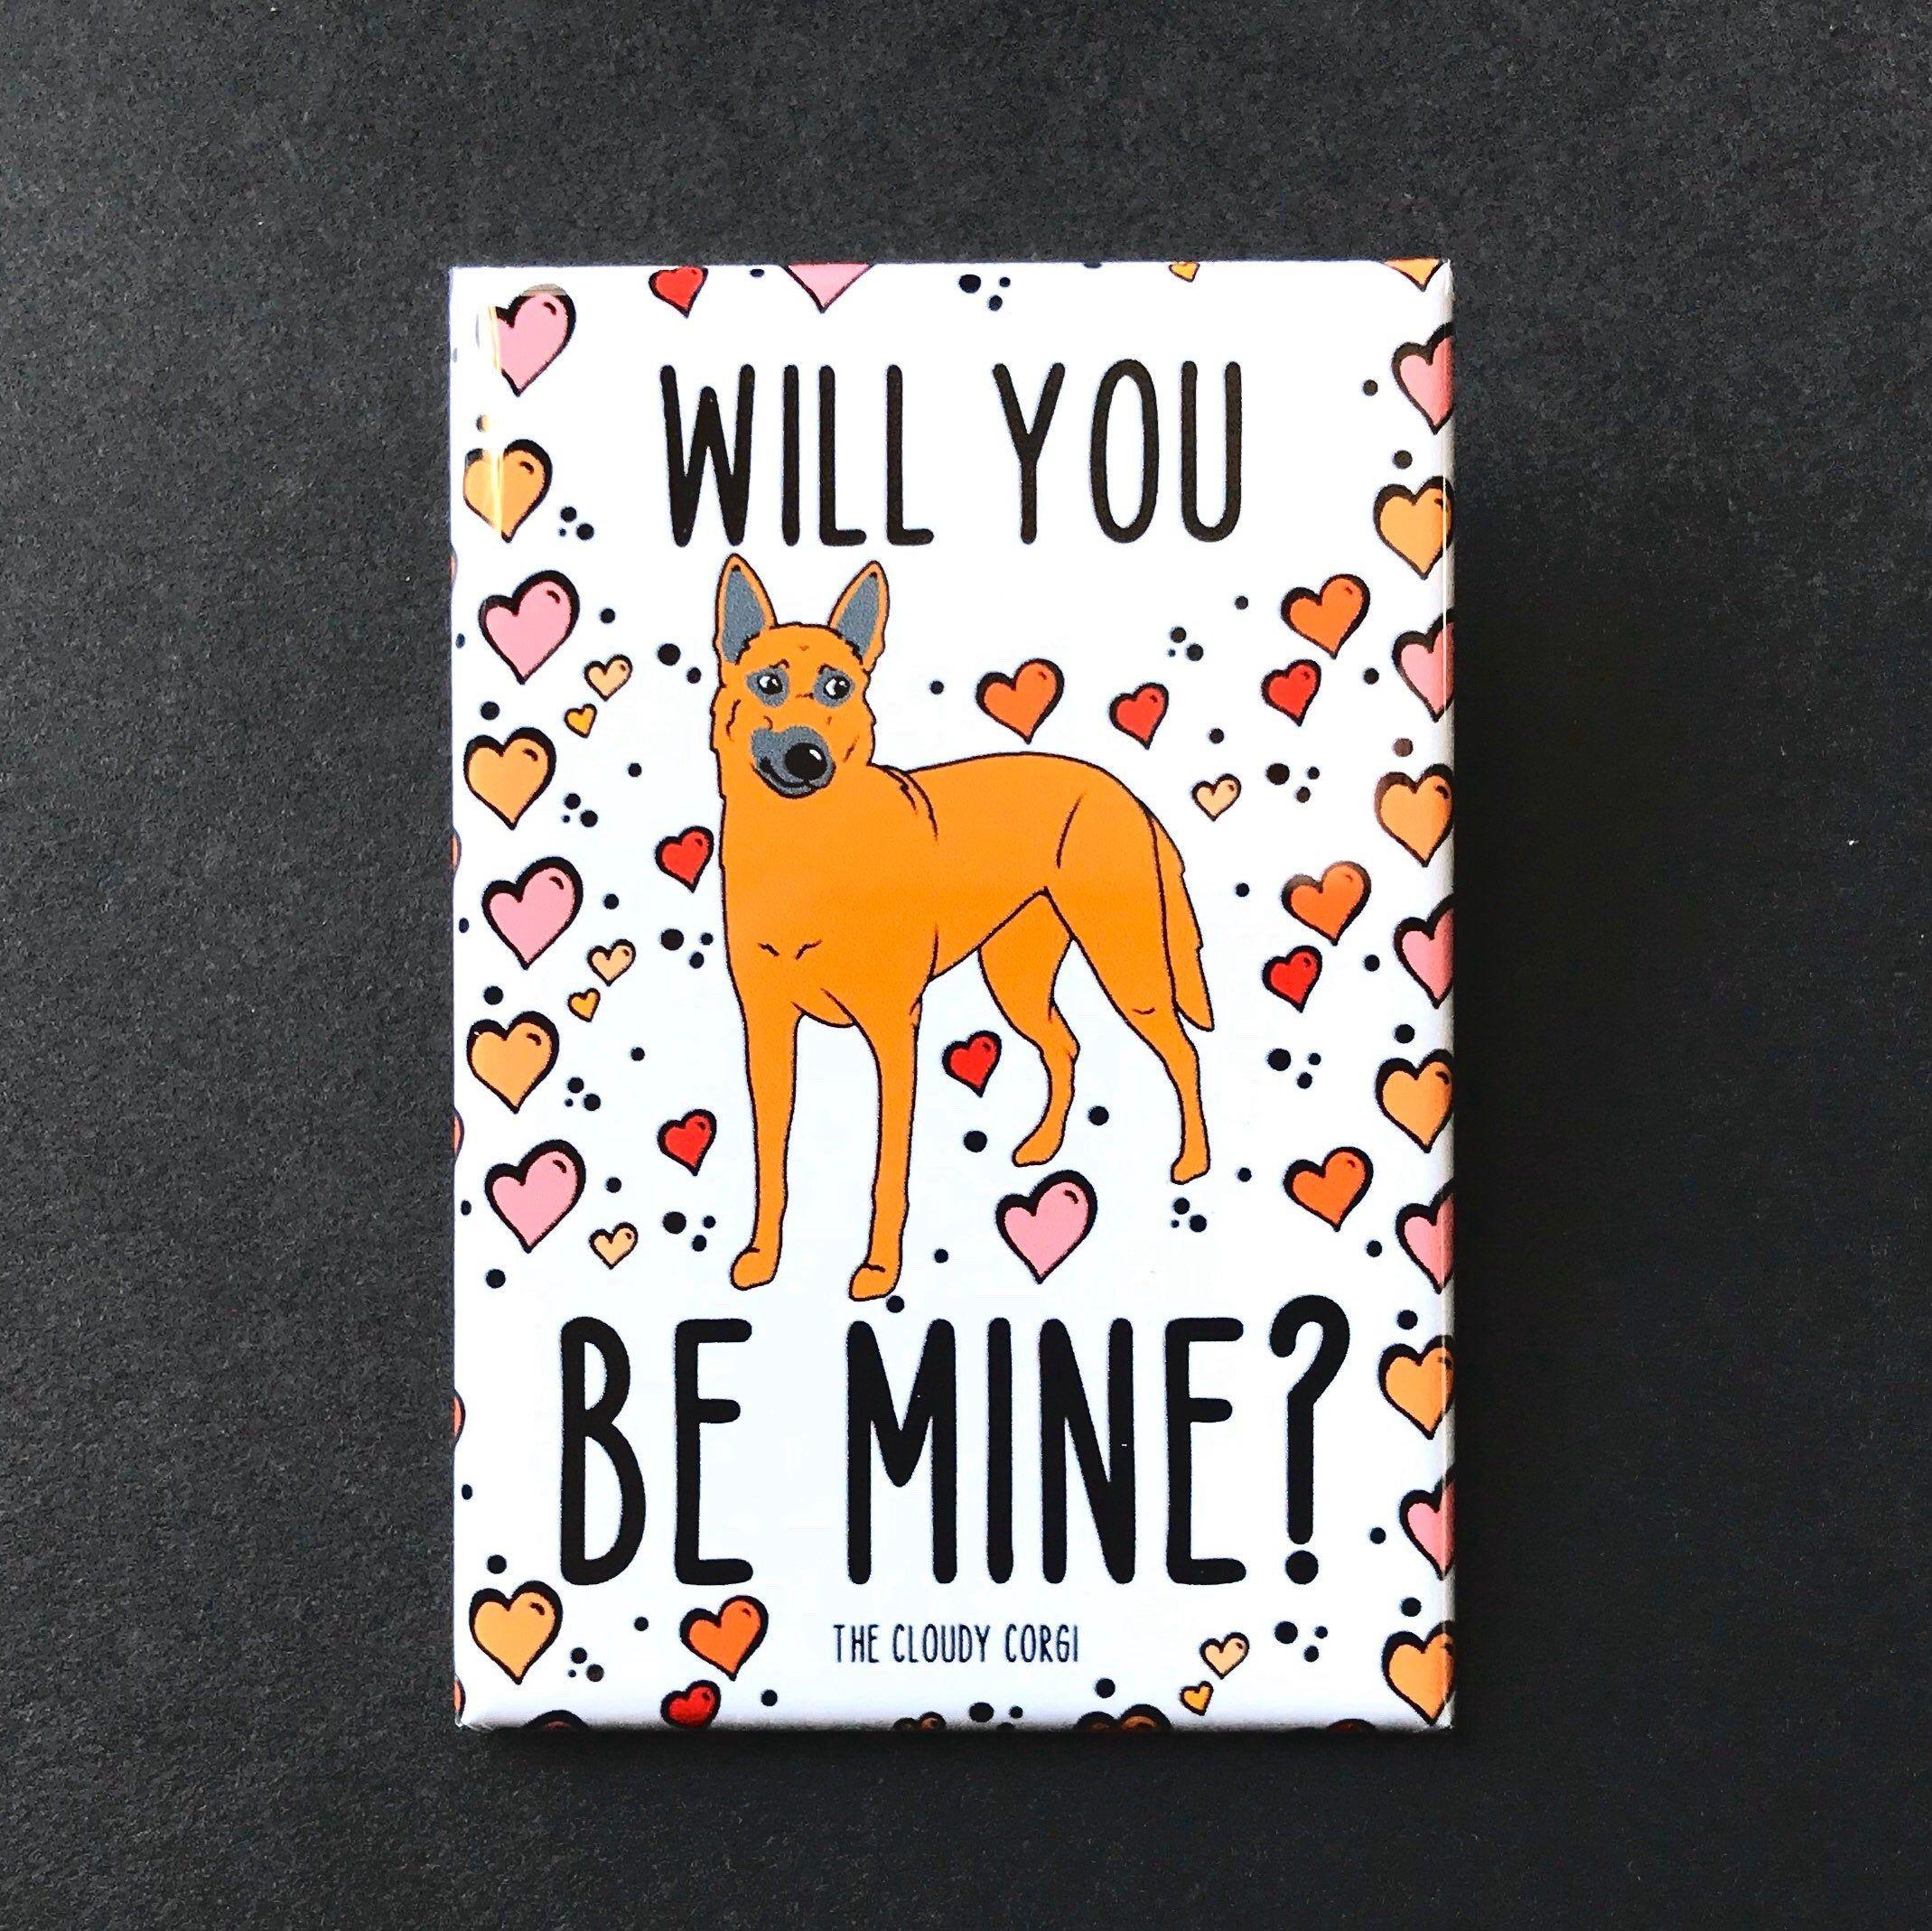 Belgian Malinois Valentines Day Magnet Will You Be Mine Handmade Dog Gifts Kitchen Fridge Accessories Holiday H Valentines Day Dog Dog Gifts Handmade Dog